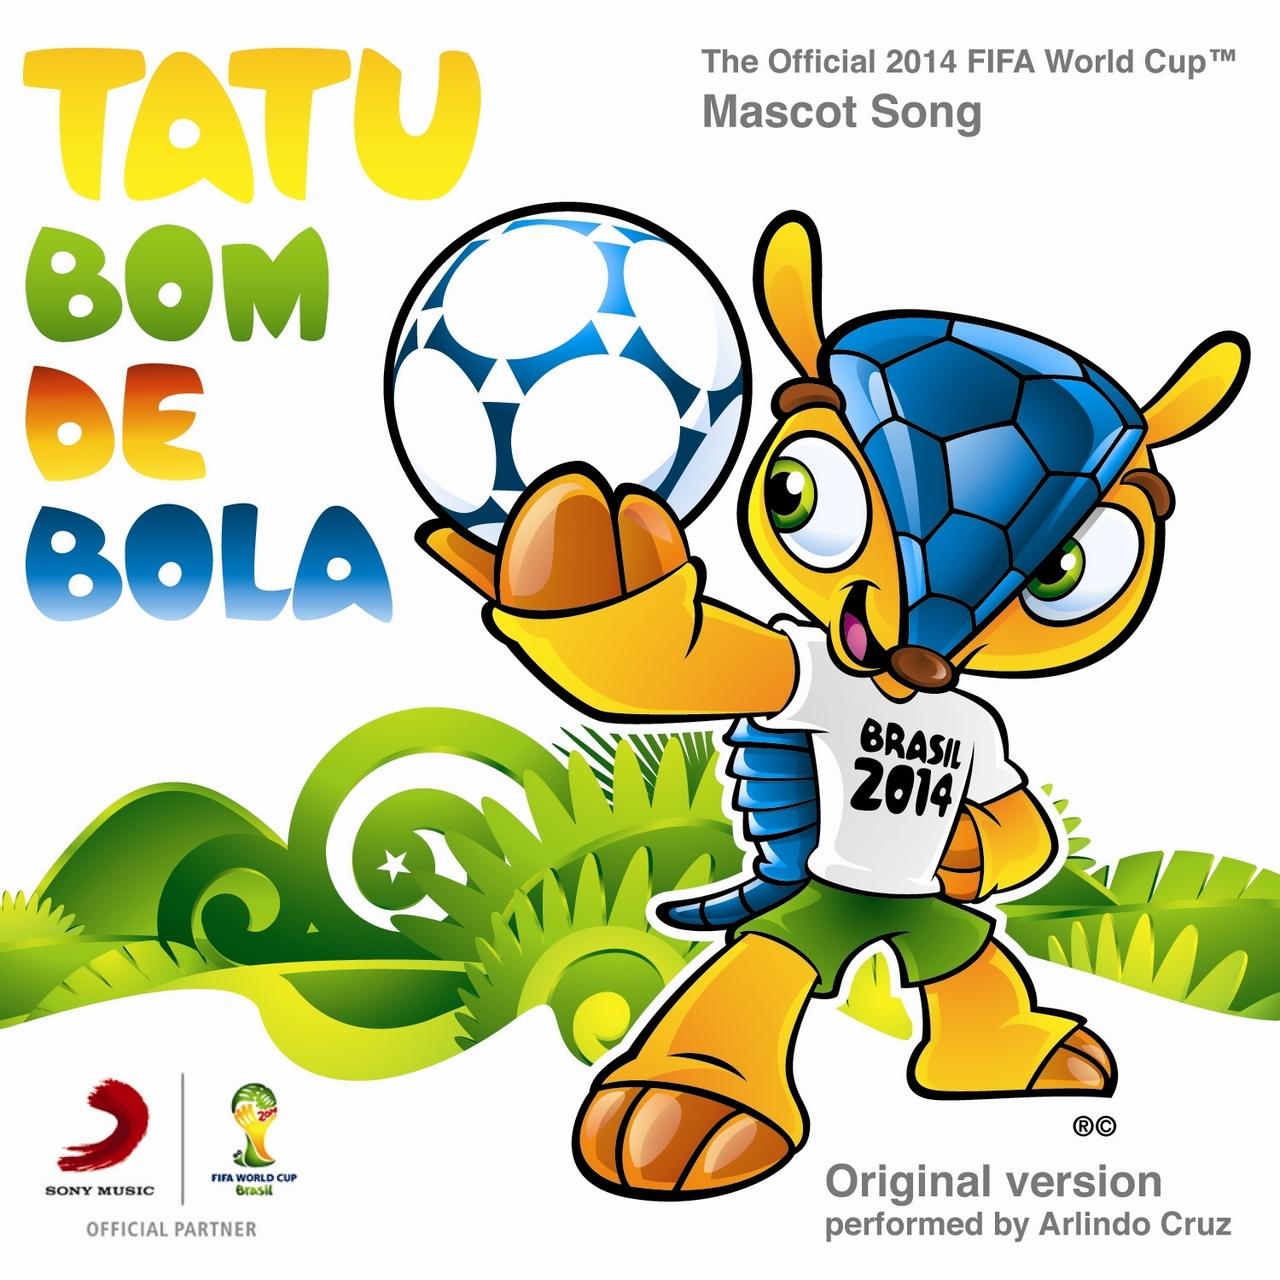 Mundial football ... - Pagina 8 Mascotte-mondiali-2014